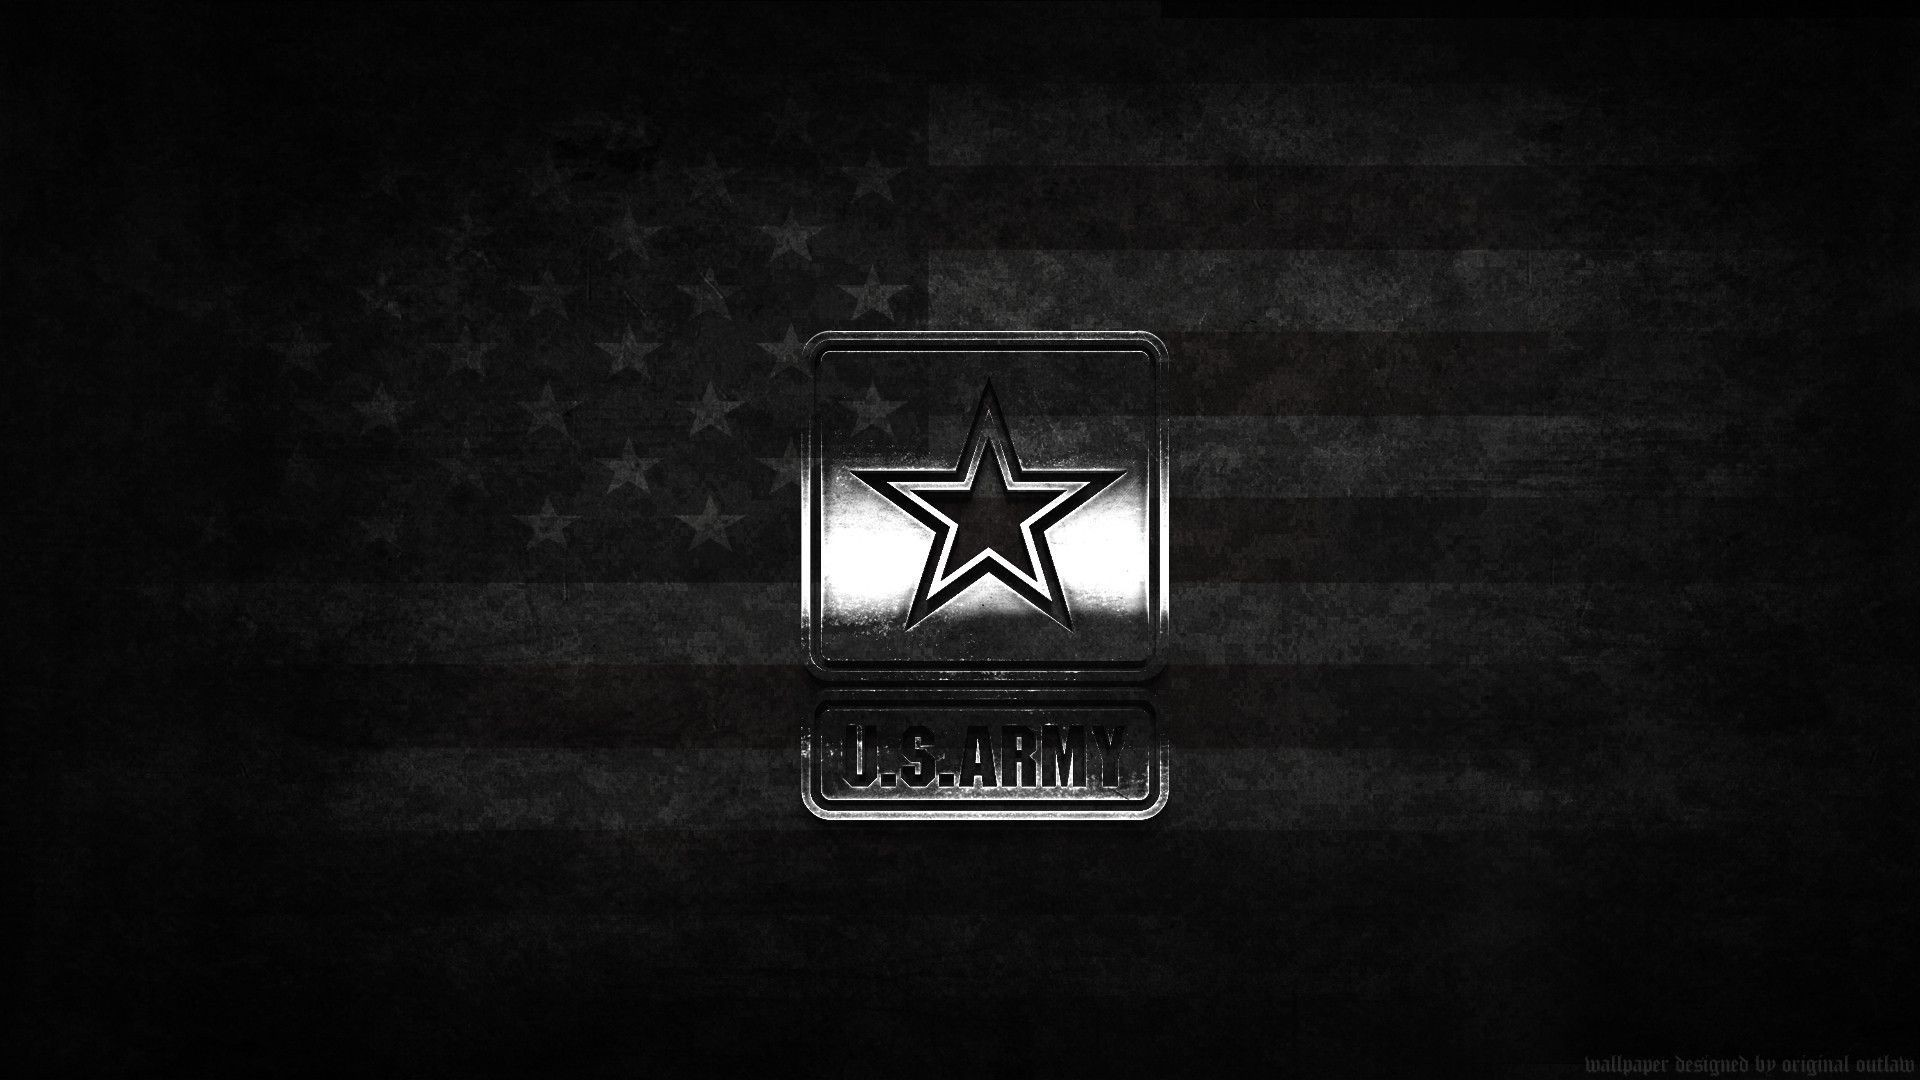 us army wallpaper hd